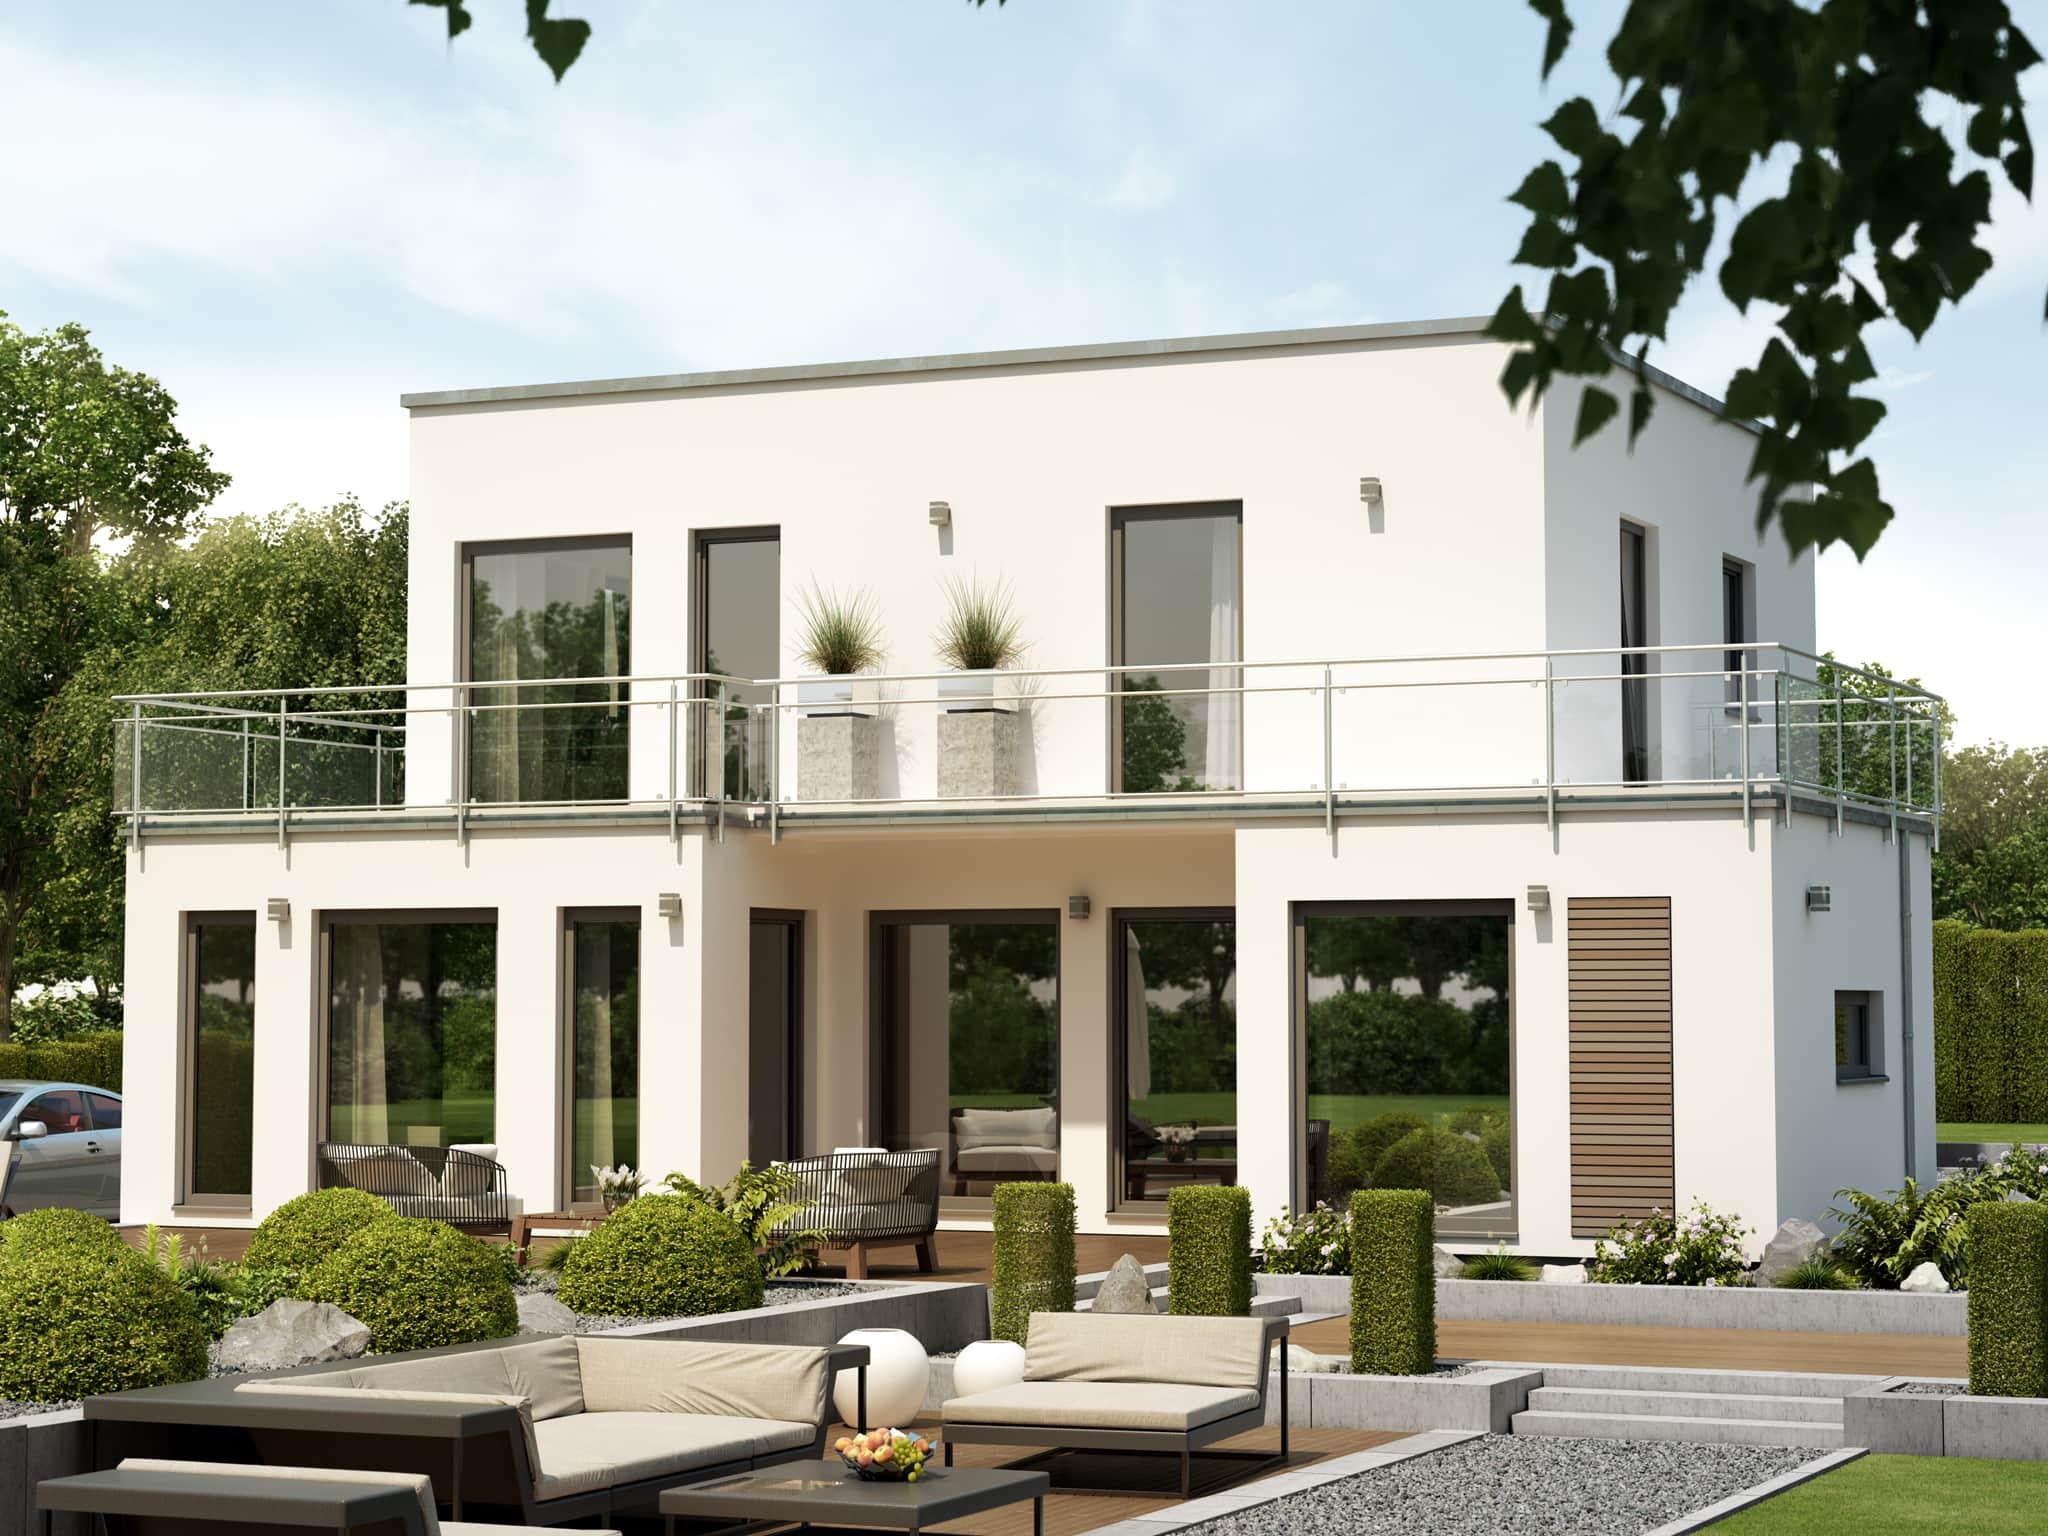 Einfamilienhaus modern mit Flachdach im Bauhausstil, 5 Zimmer, 125 qm - Fertighaus Living Haus SUNSHINE 125 V7 - HausbauDirekt.de